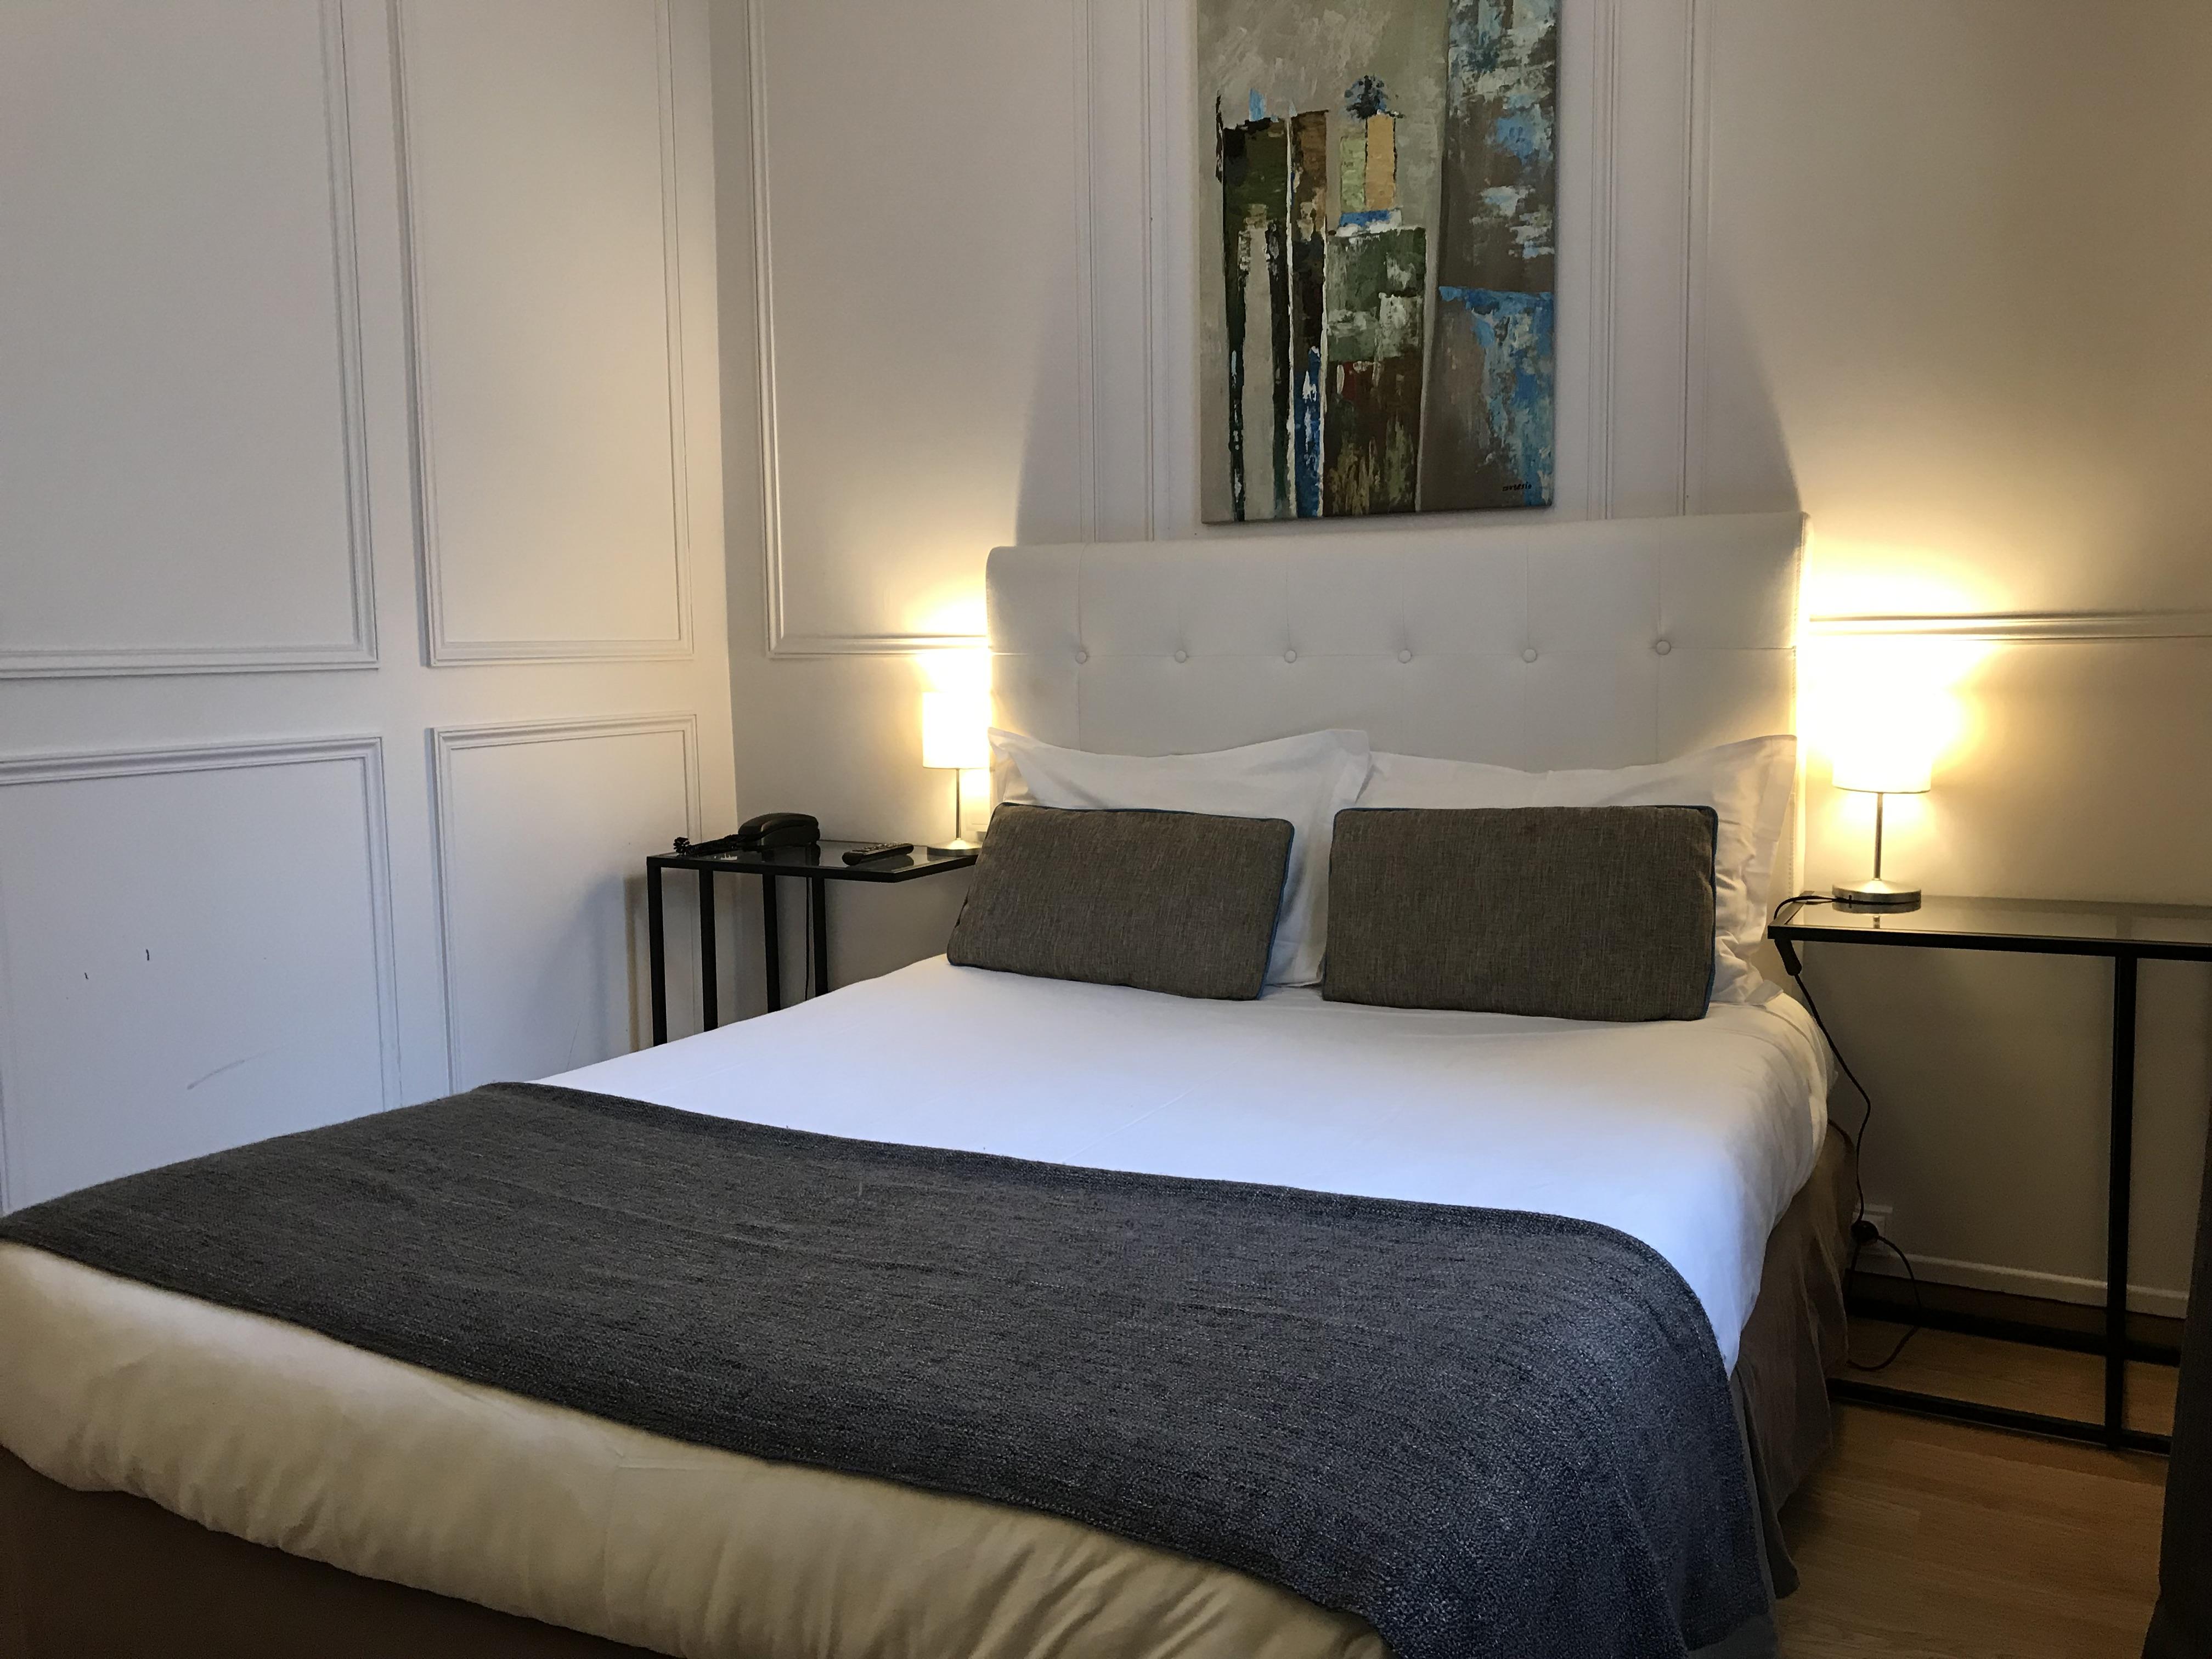 hotel-dauphin-puteaux-classique-19